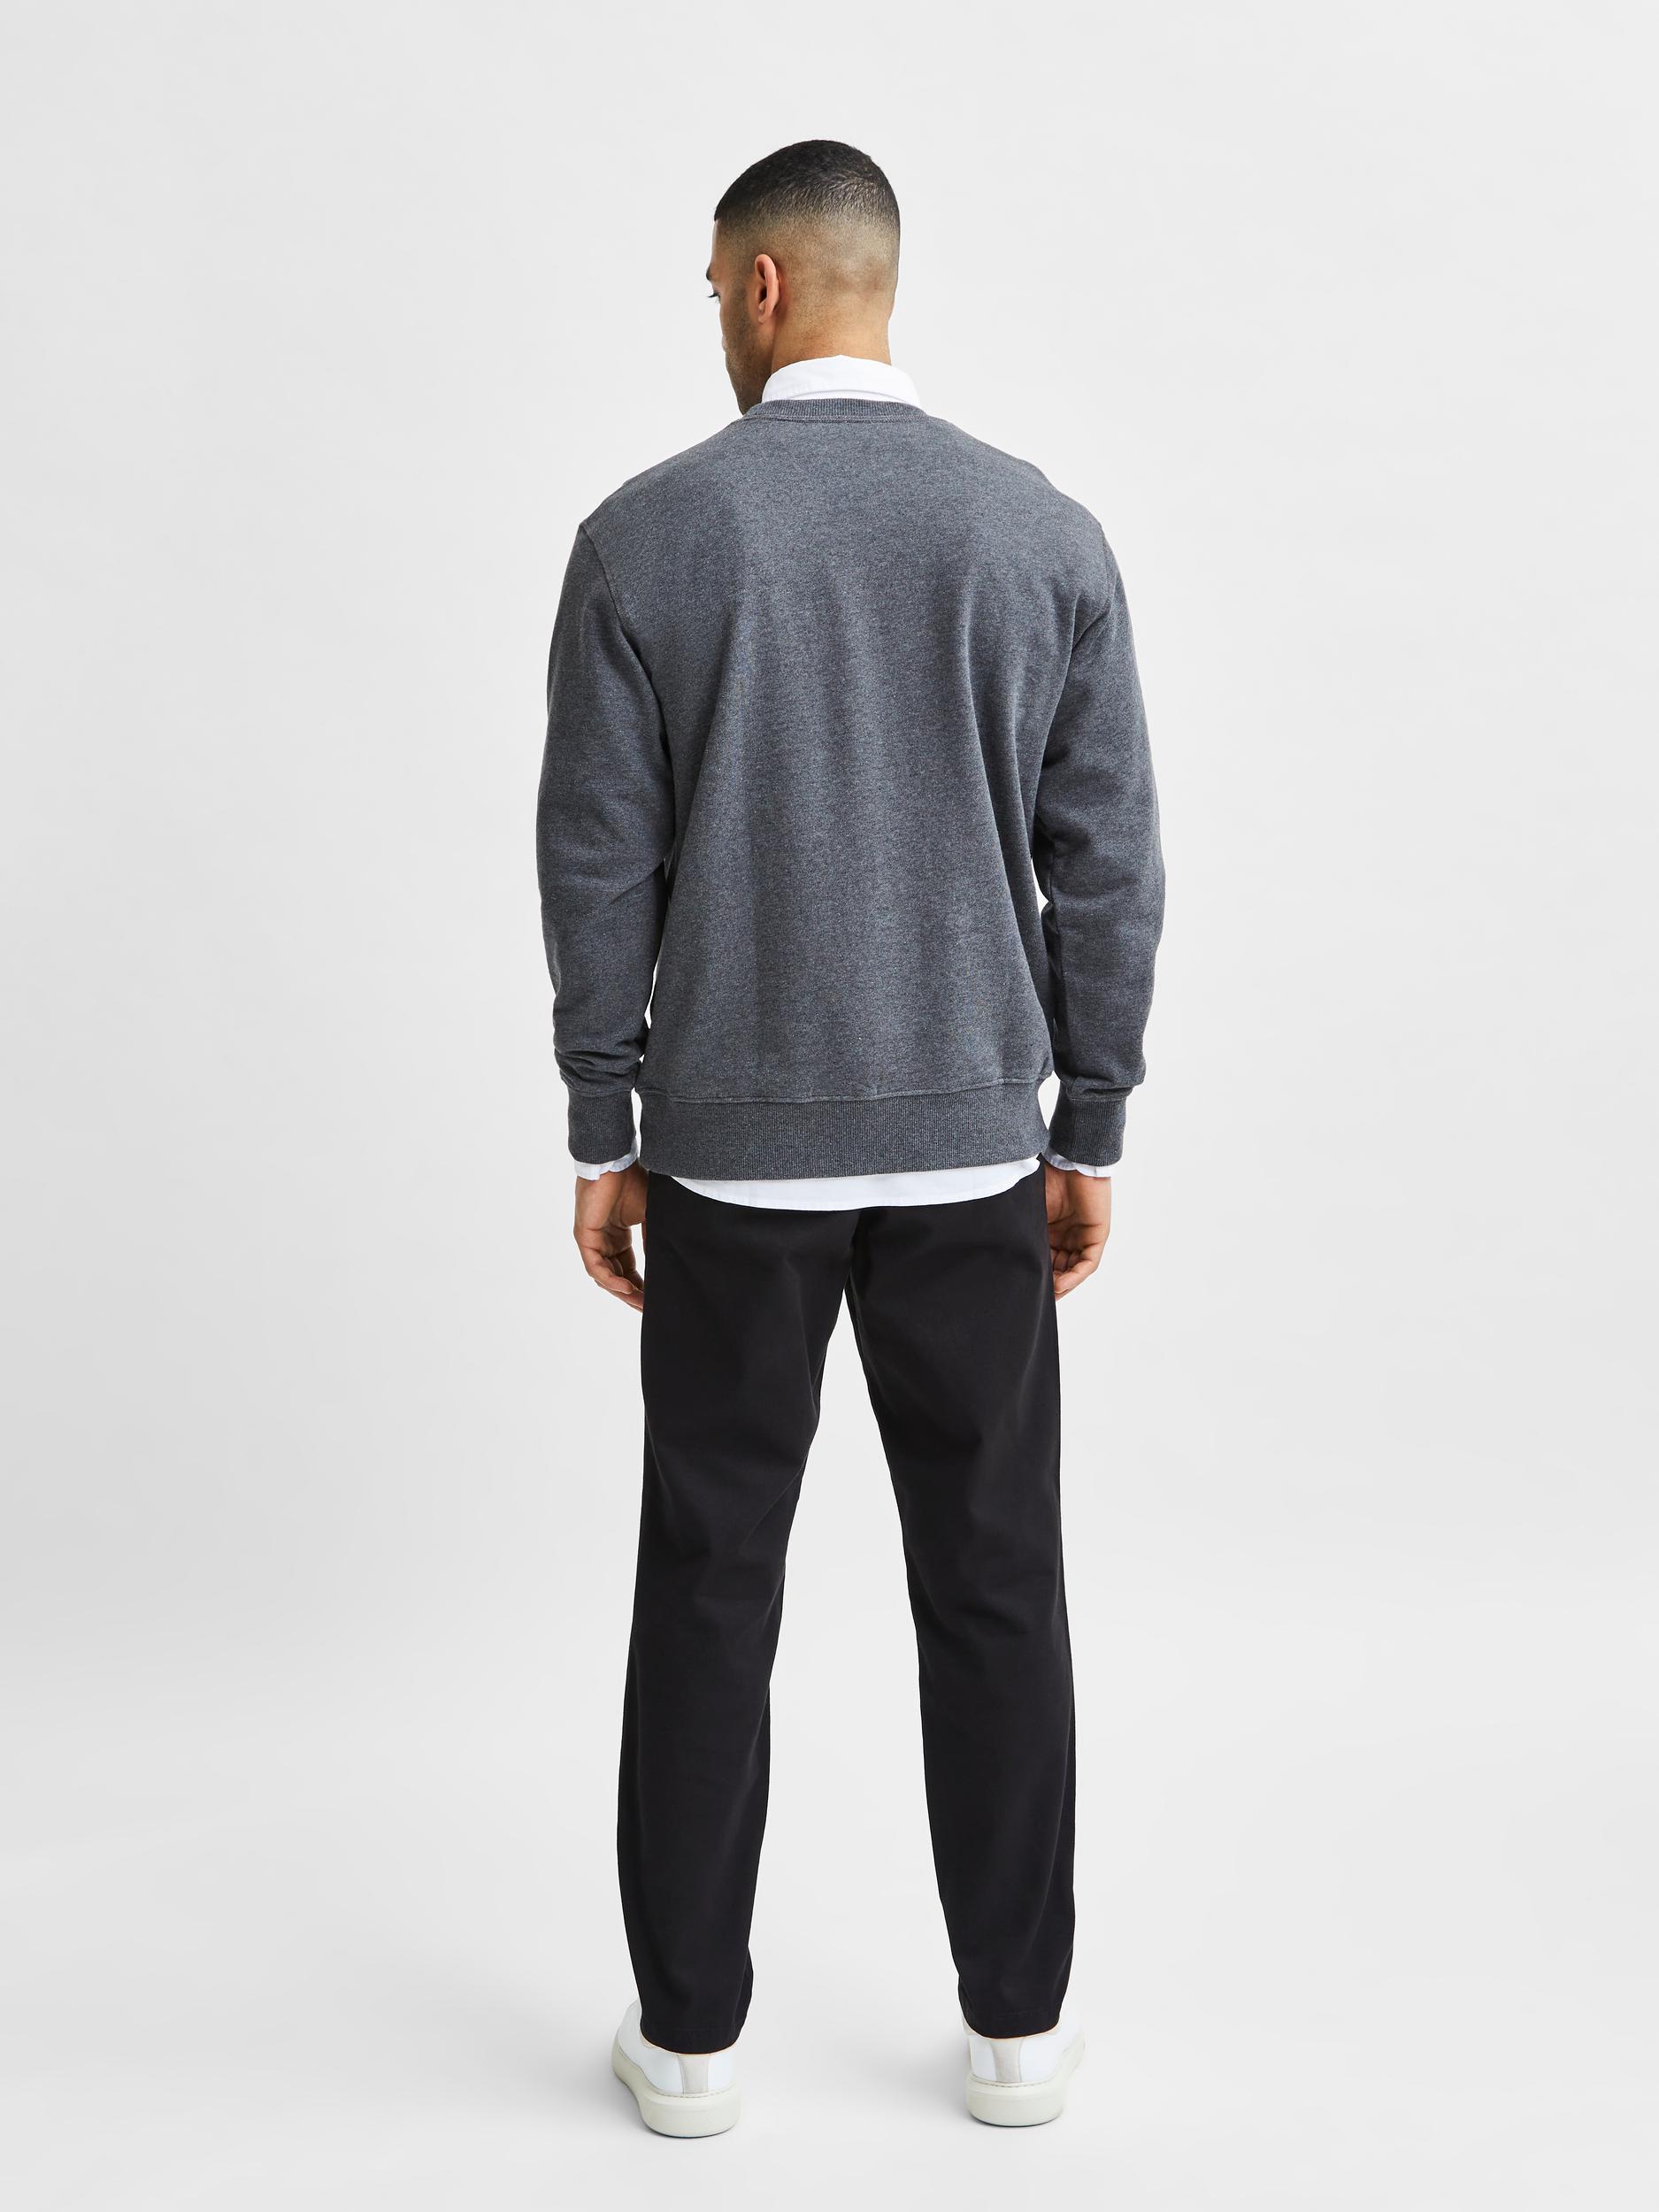 Selected Homme Jason Crew Neck sweatshirt, antracit, large